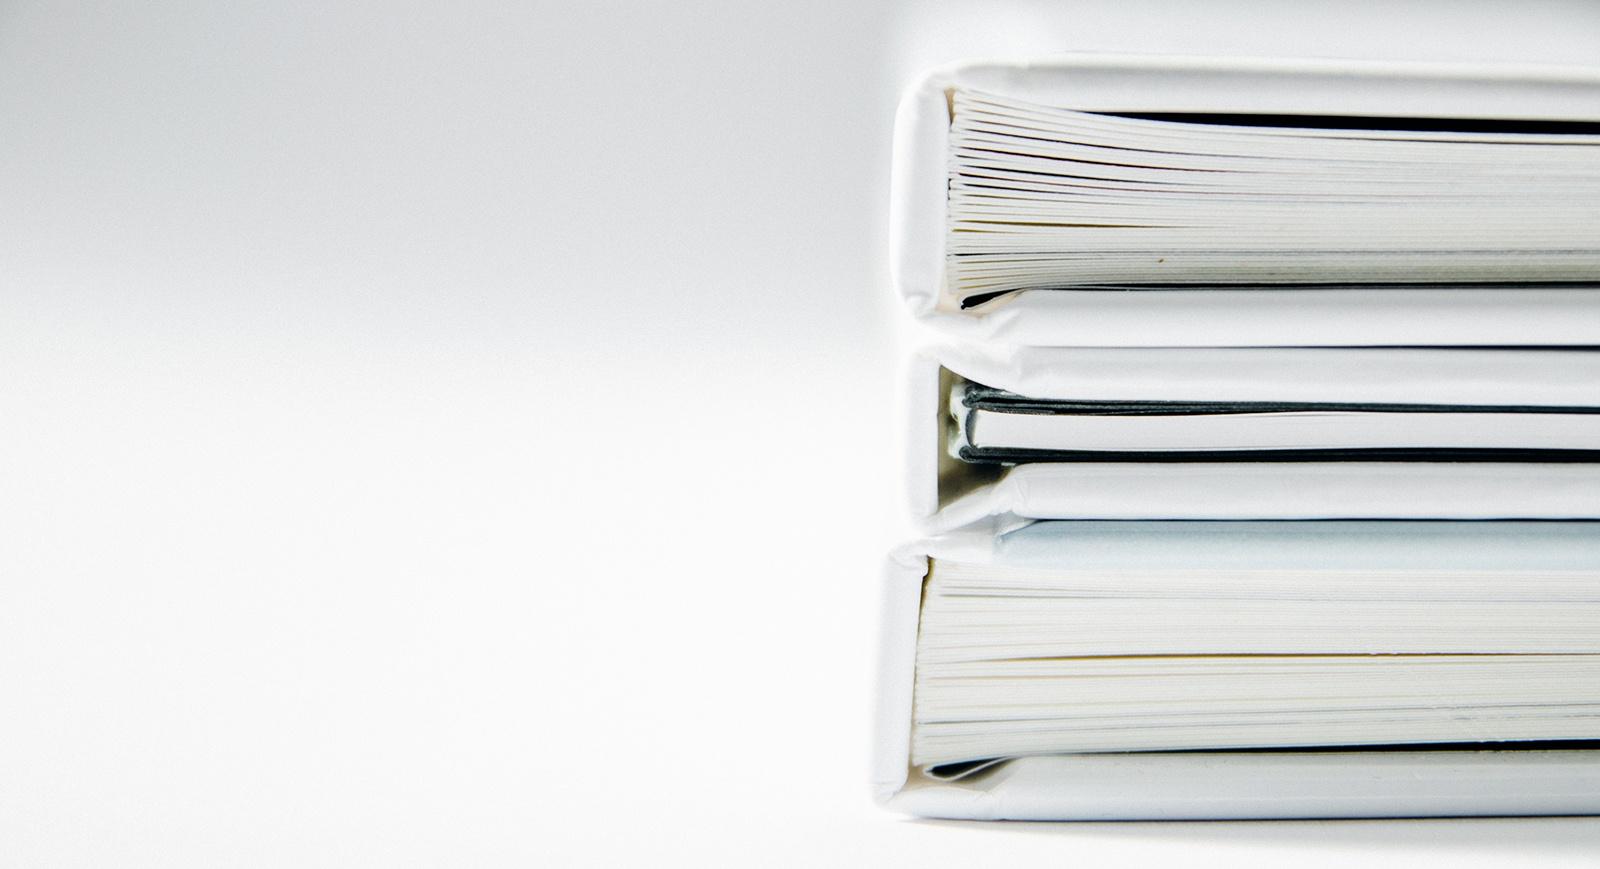 Cyber Insurance - Worth the paper it's written on?